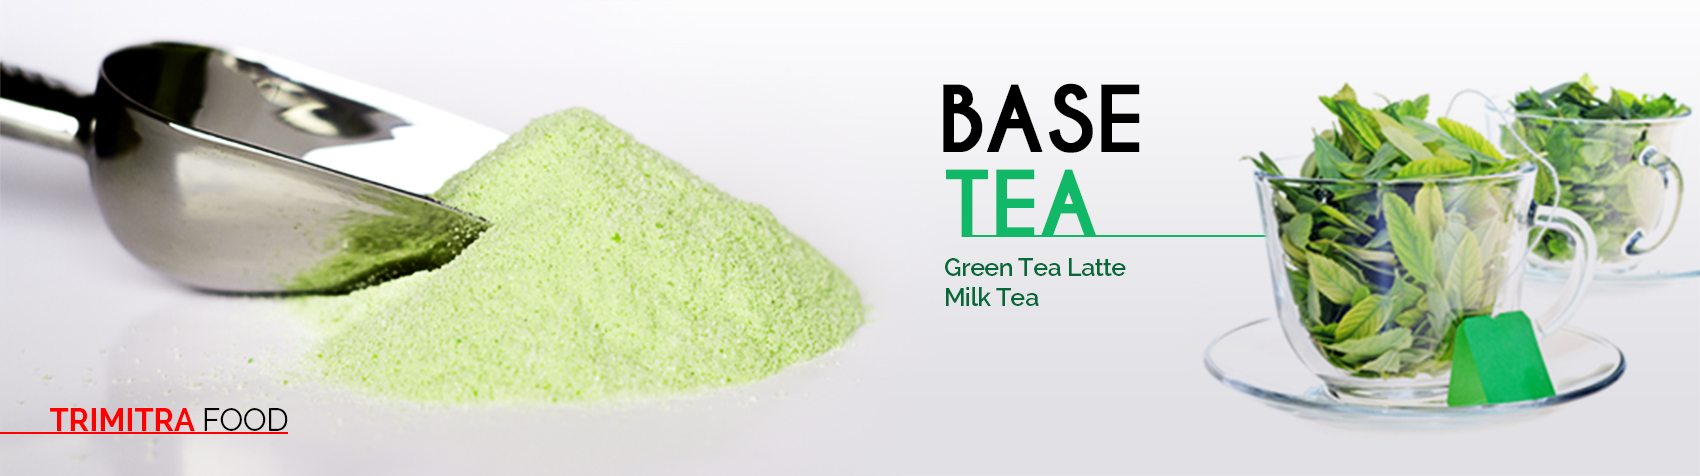 Header Base Tea 2 rev